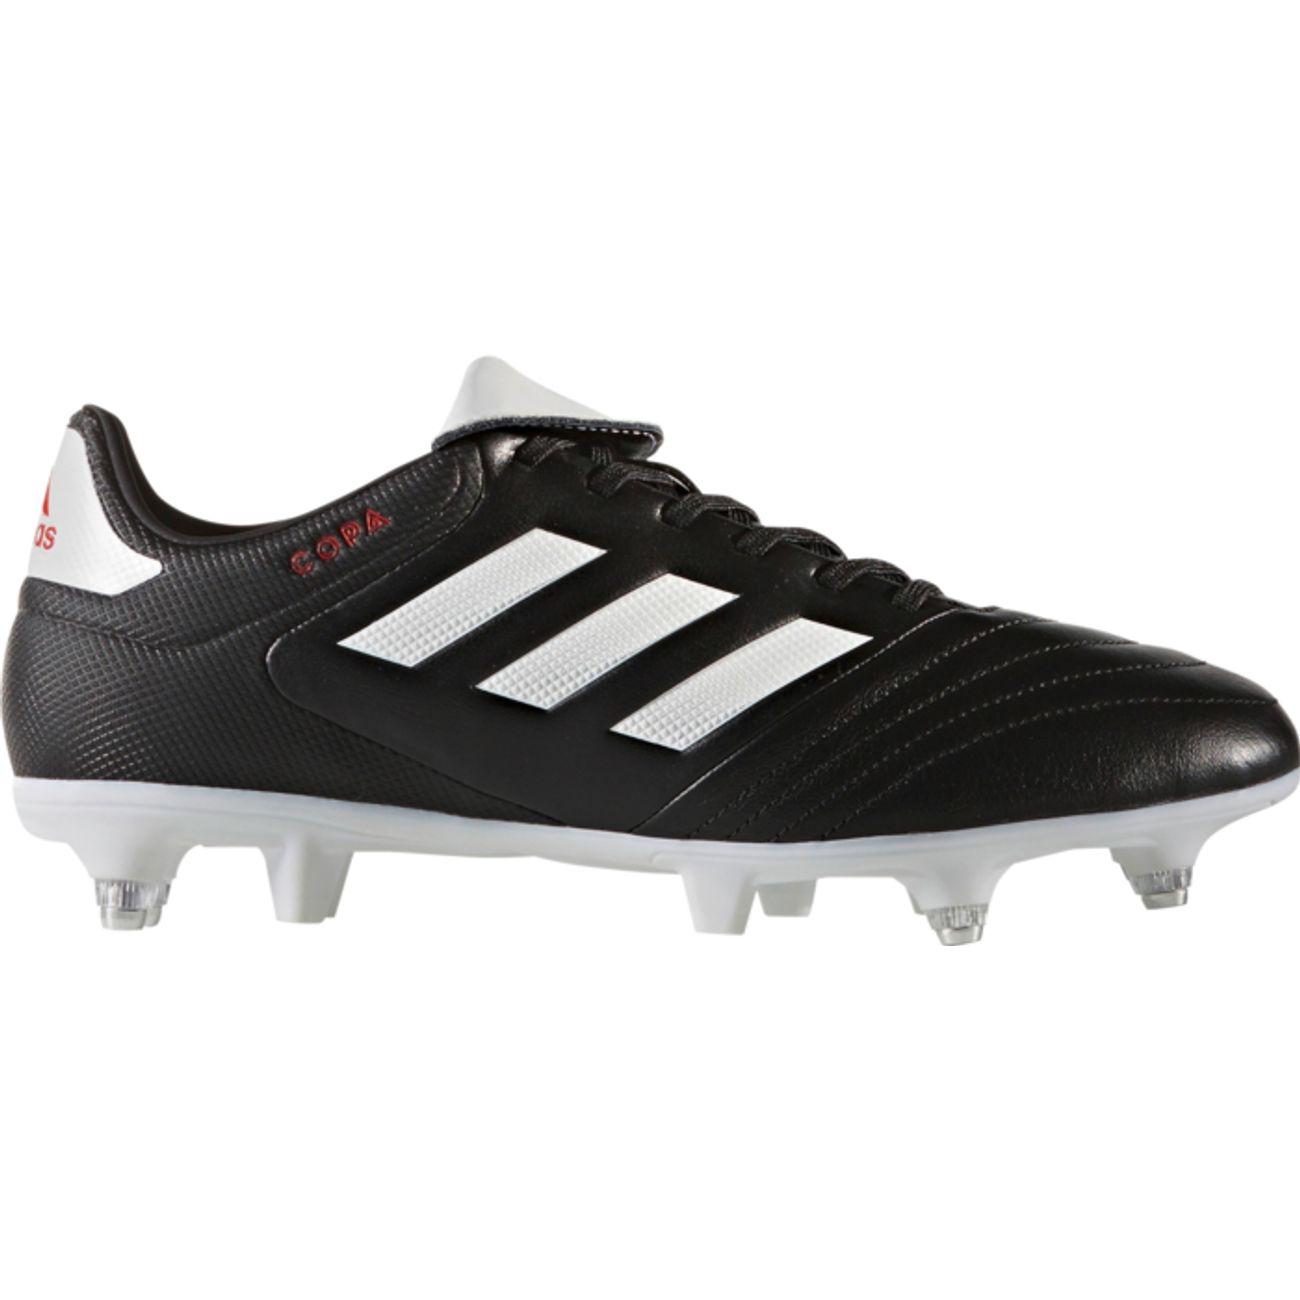 Sg Adulte Copa 17 3 Adidas Chaussures dWQoxrCBe